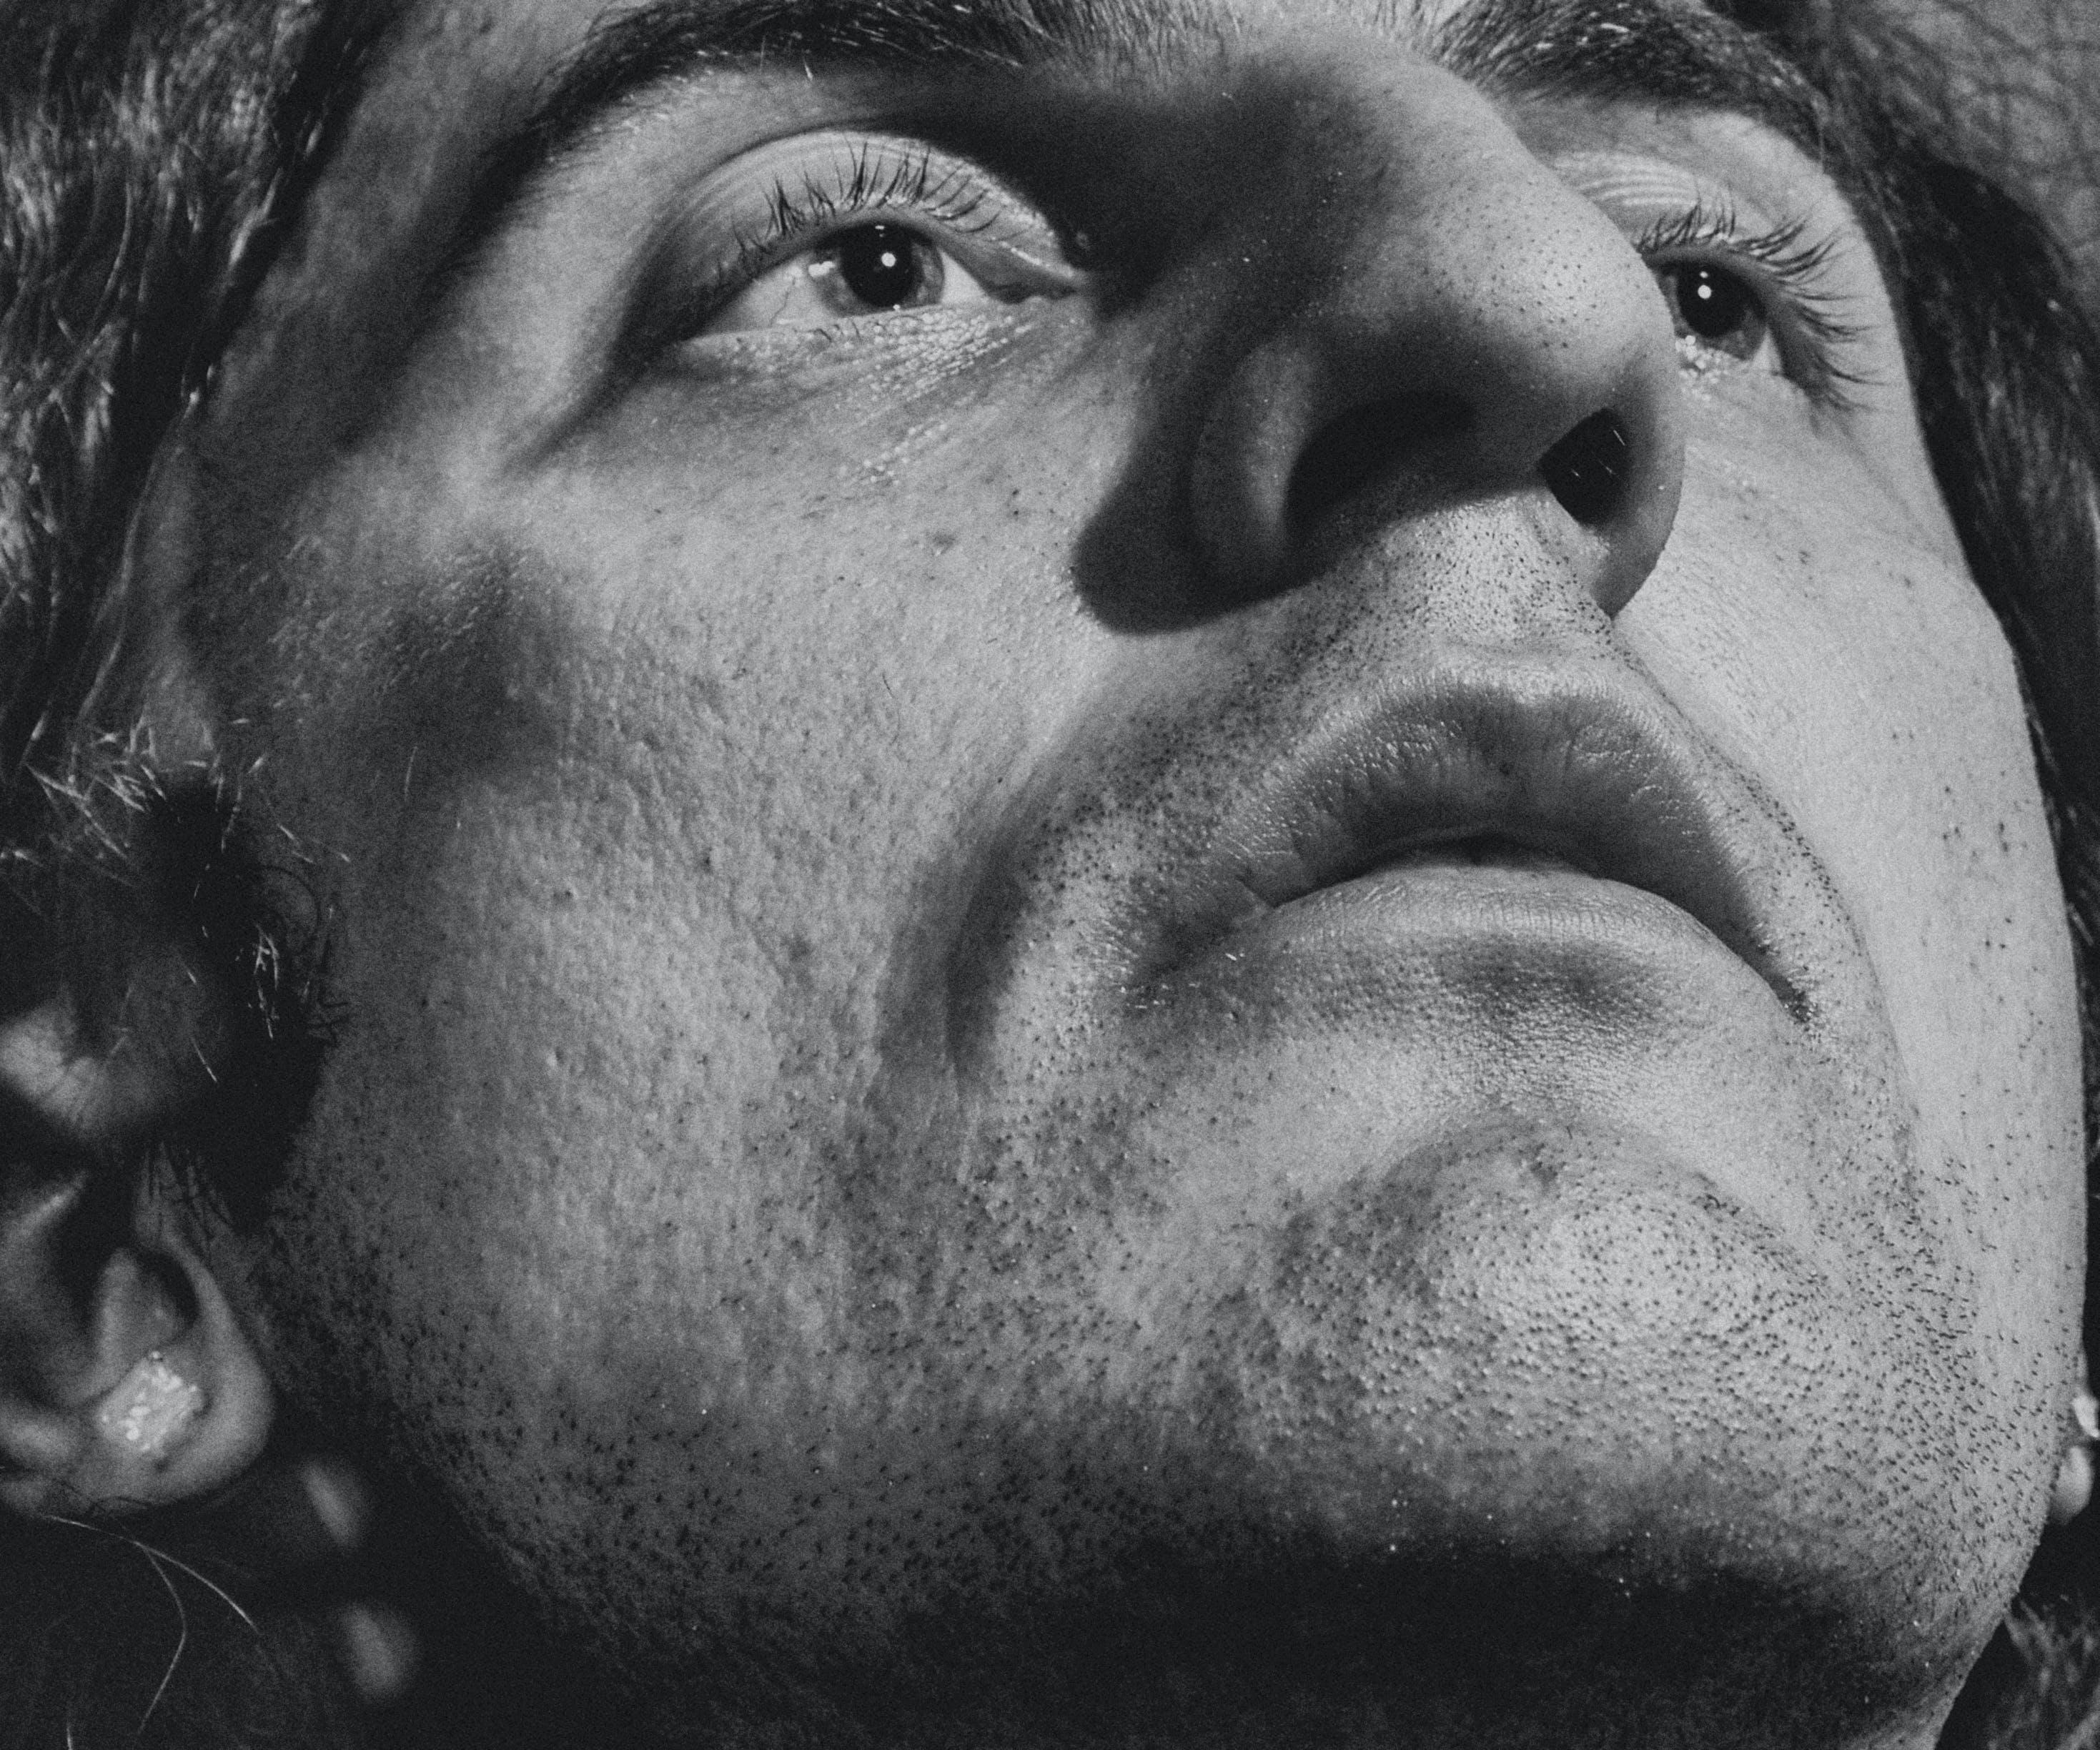 Kostenloses Stock Foto zu мужчина, портрет, студия, черное и белое